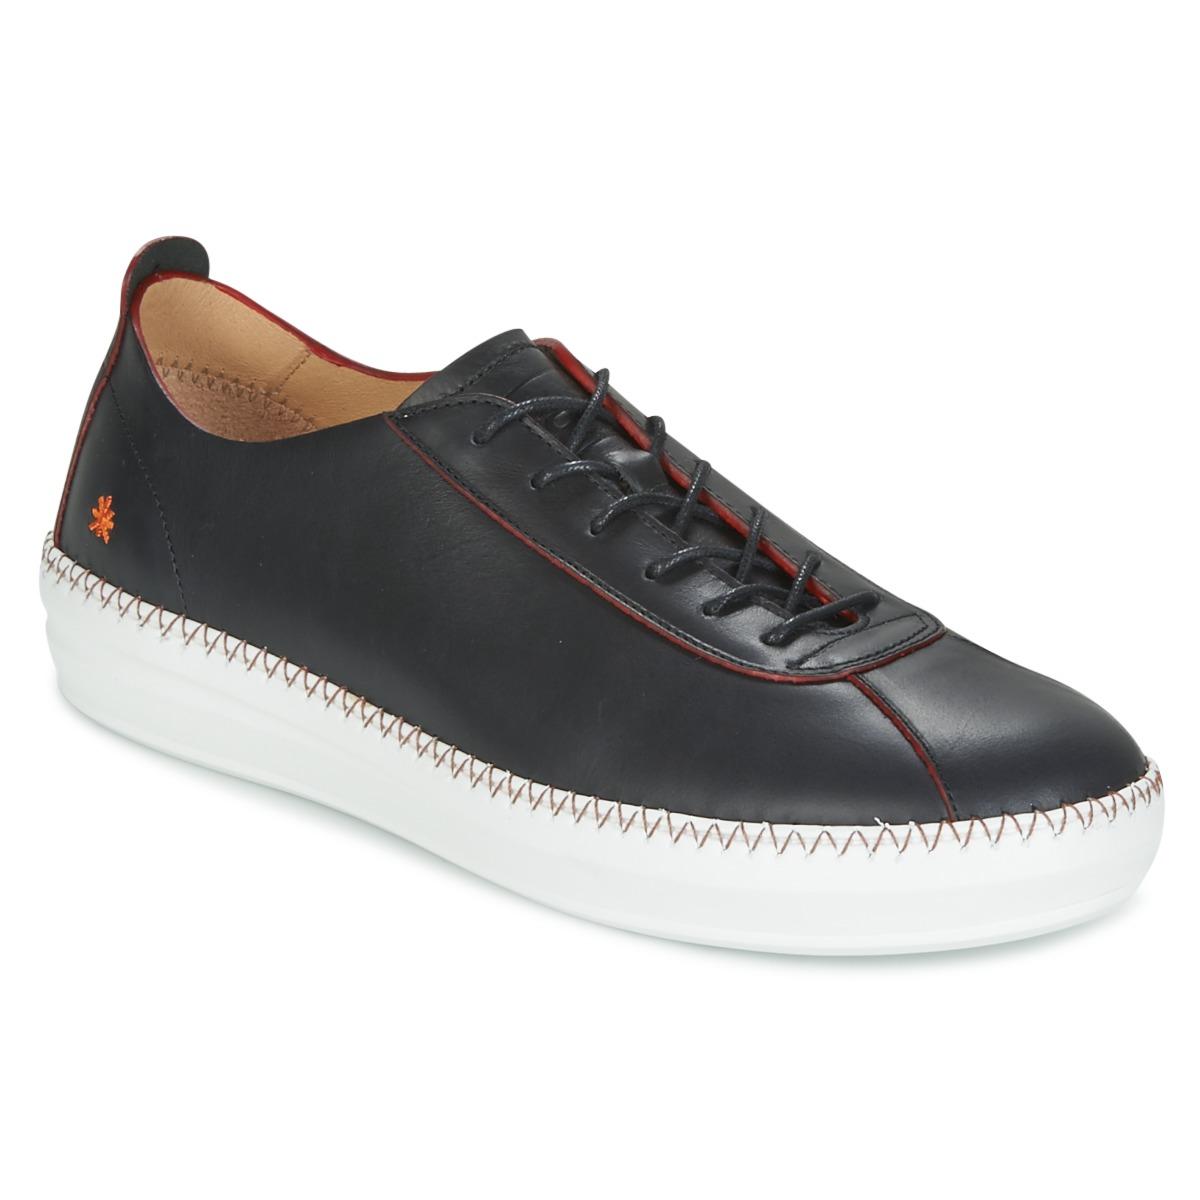 Art TIBIDABO 1342 Schwarz - Kostenloser Versand bei Spartoode ! - Schuhe Sneaker Low Damen 90,30 €